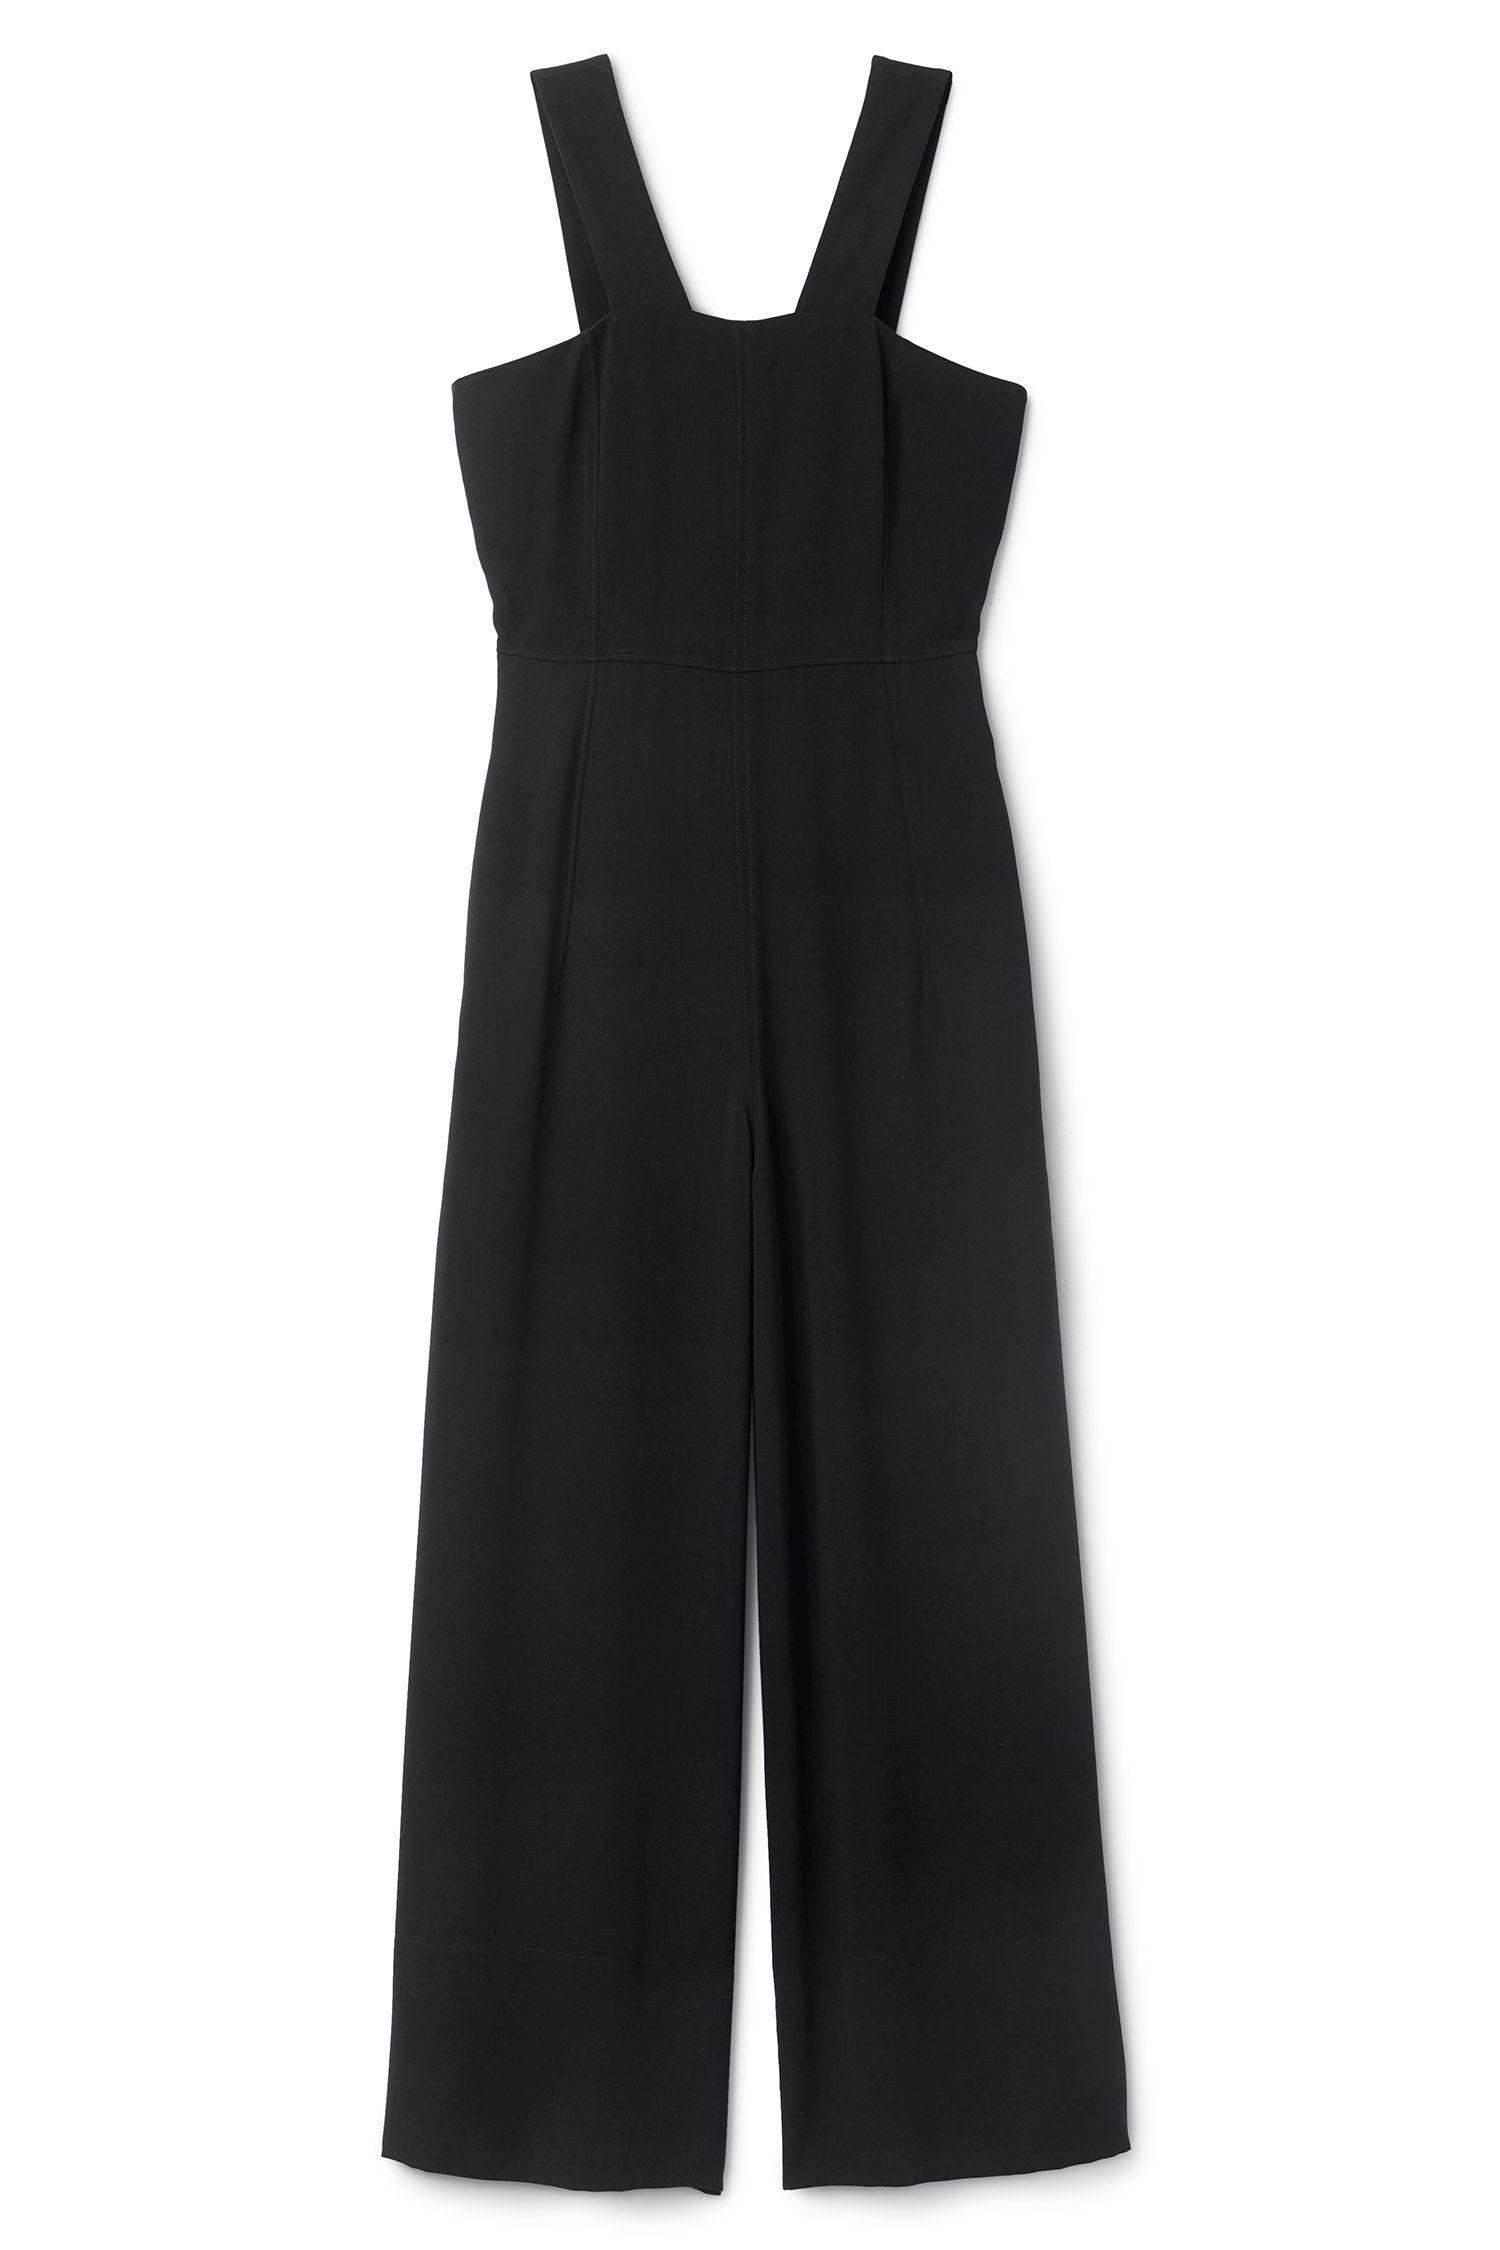 e5882cabe031 Cyan Jumpsuit - Black - Dresses   Jumpsuits - Weekday